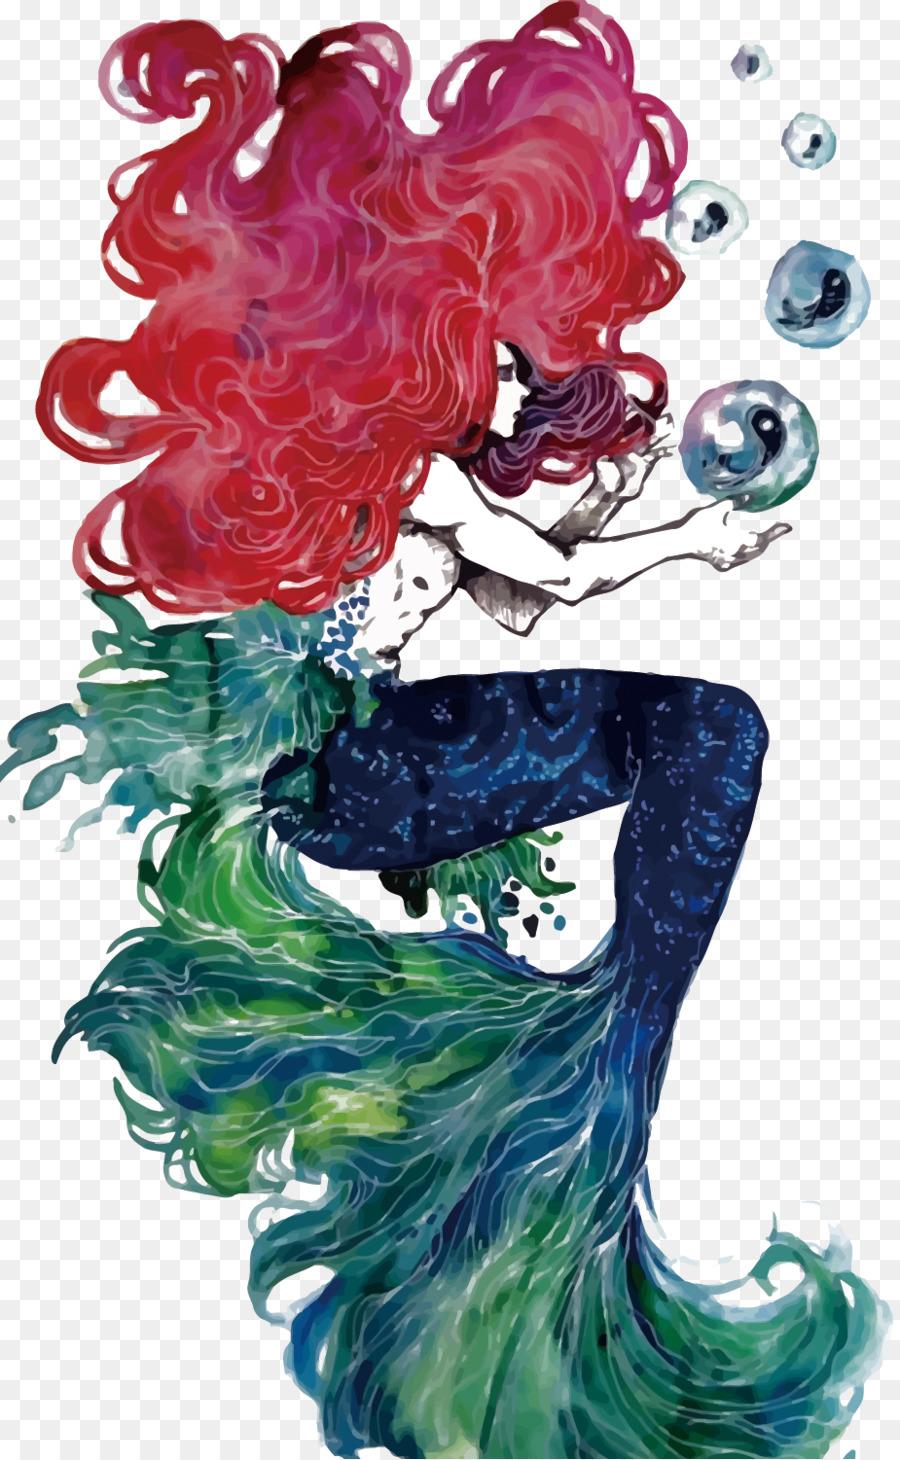 ariel the little mermaid illustration